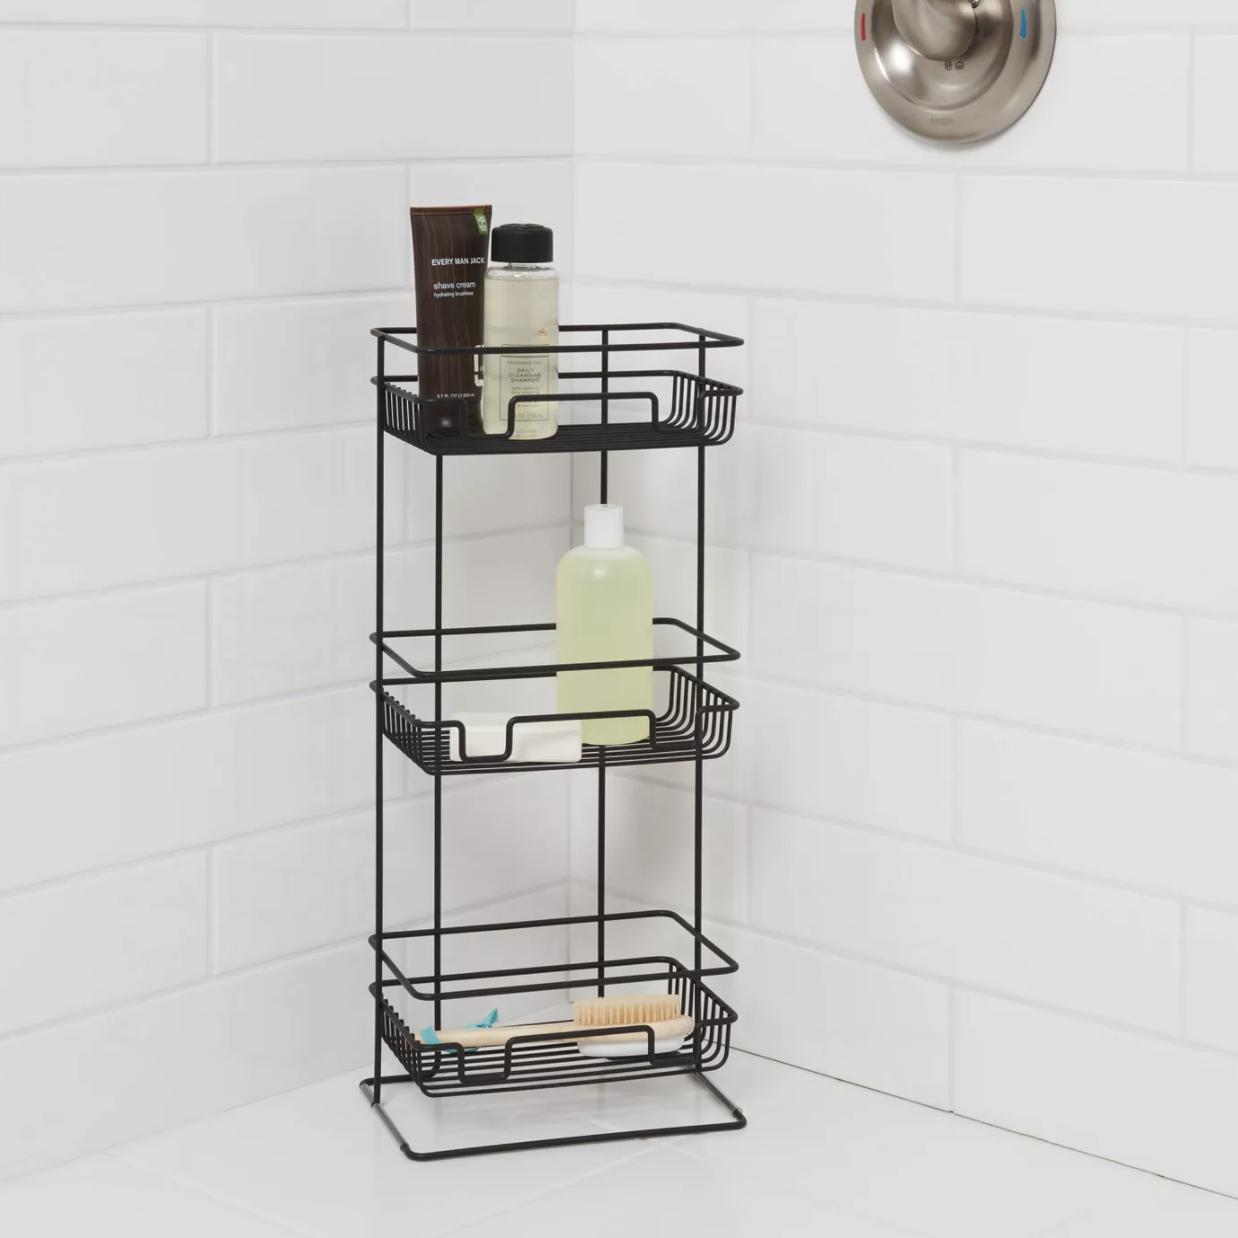 Three shelf organizer placed on shower floor